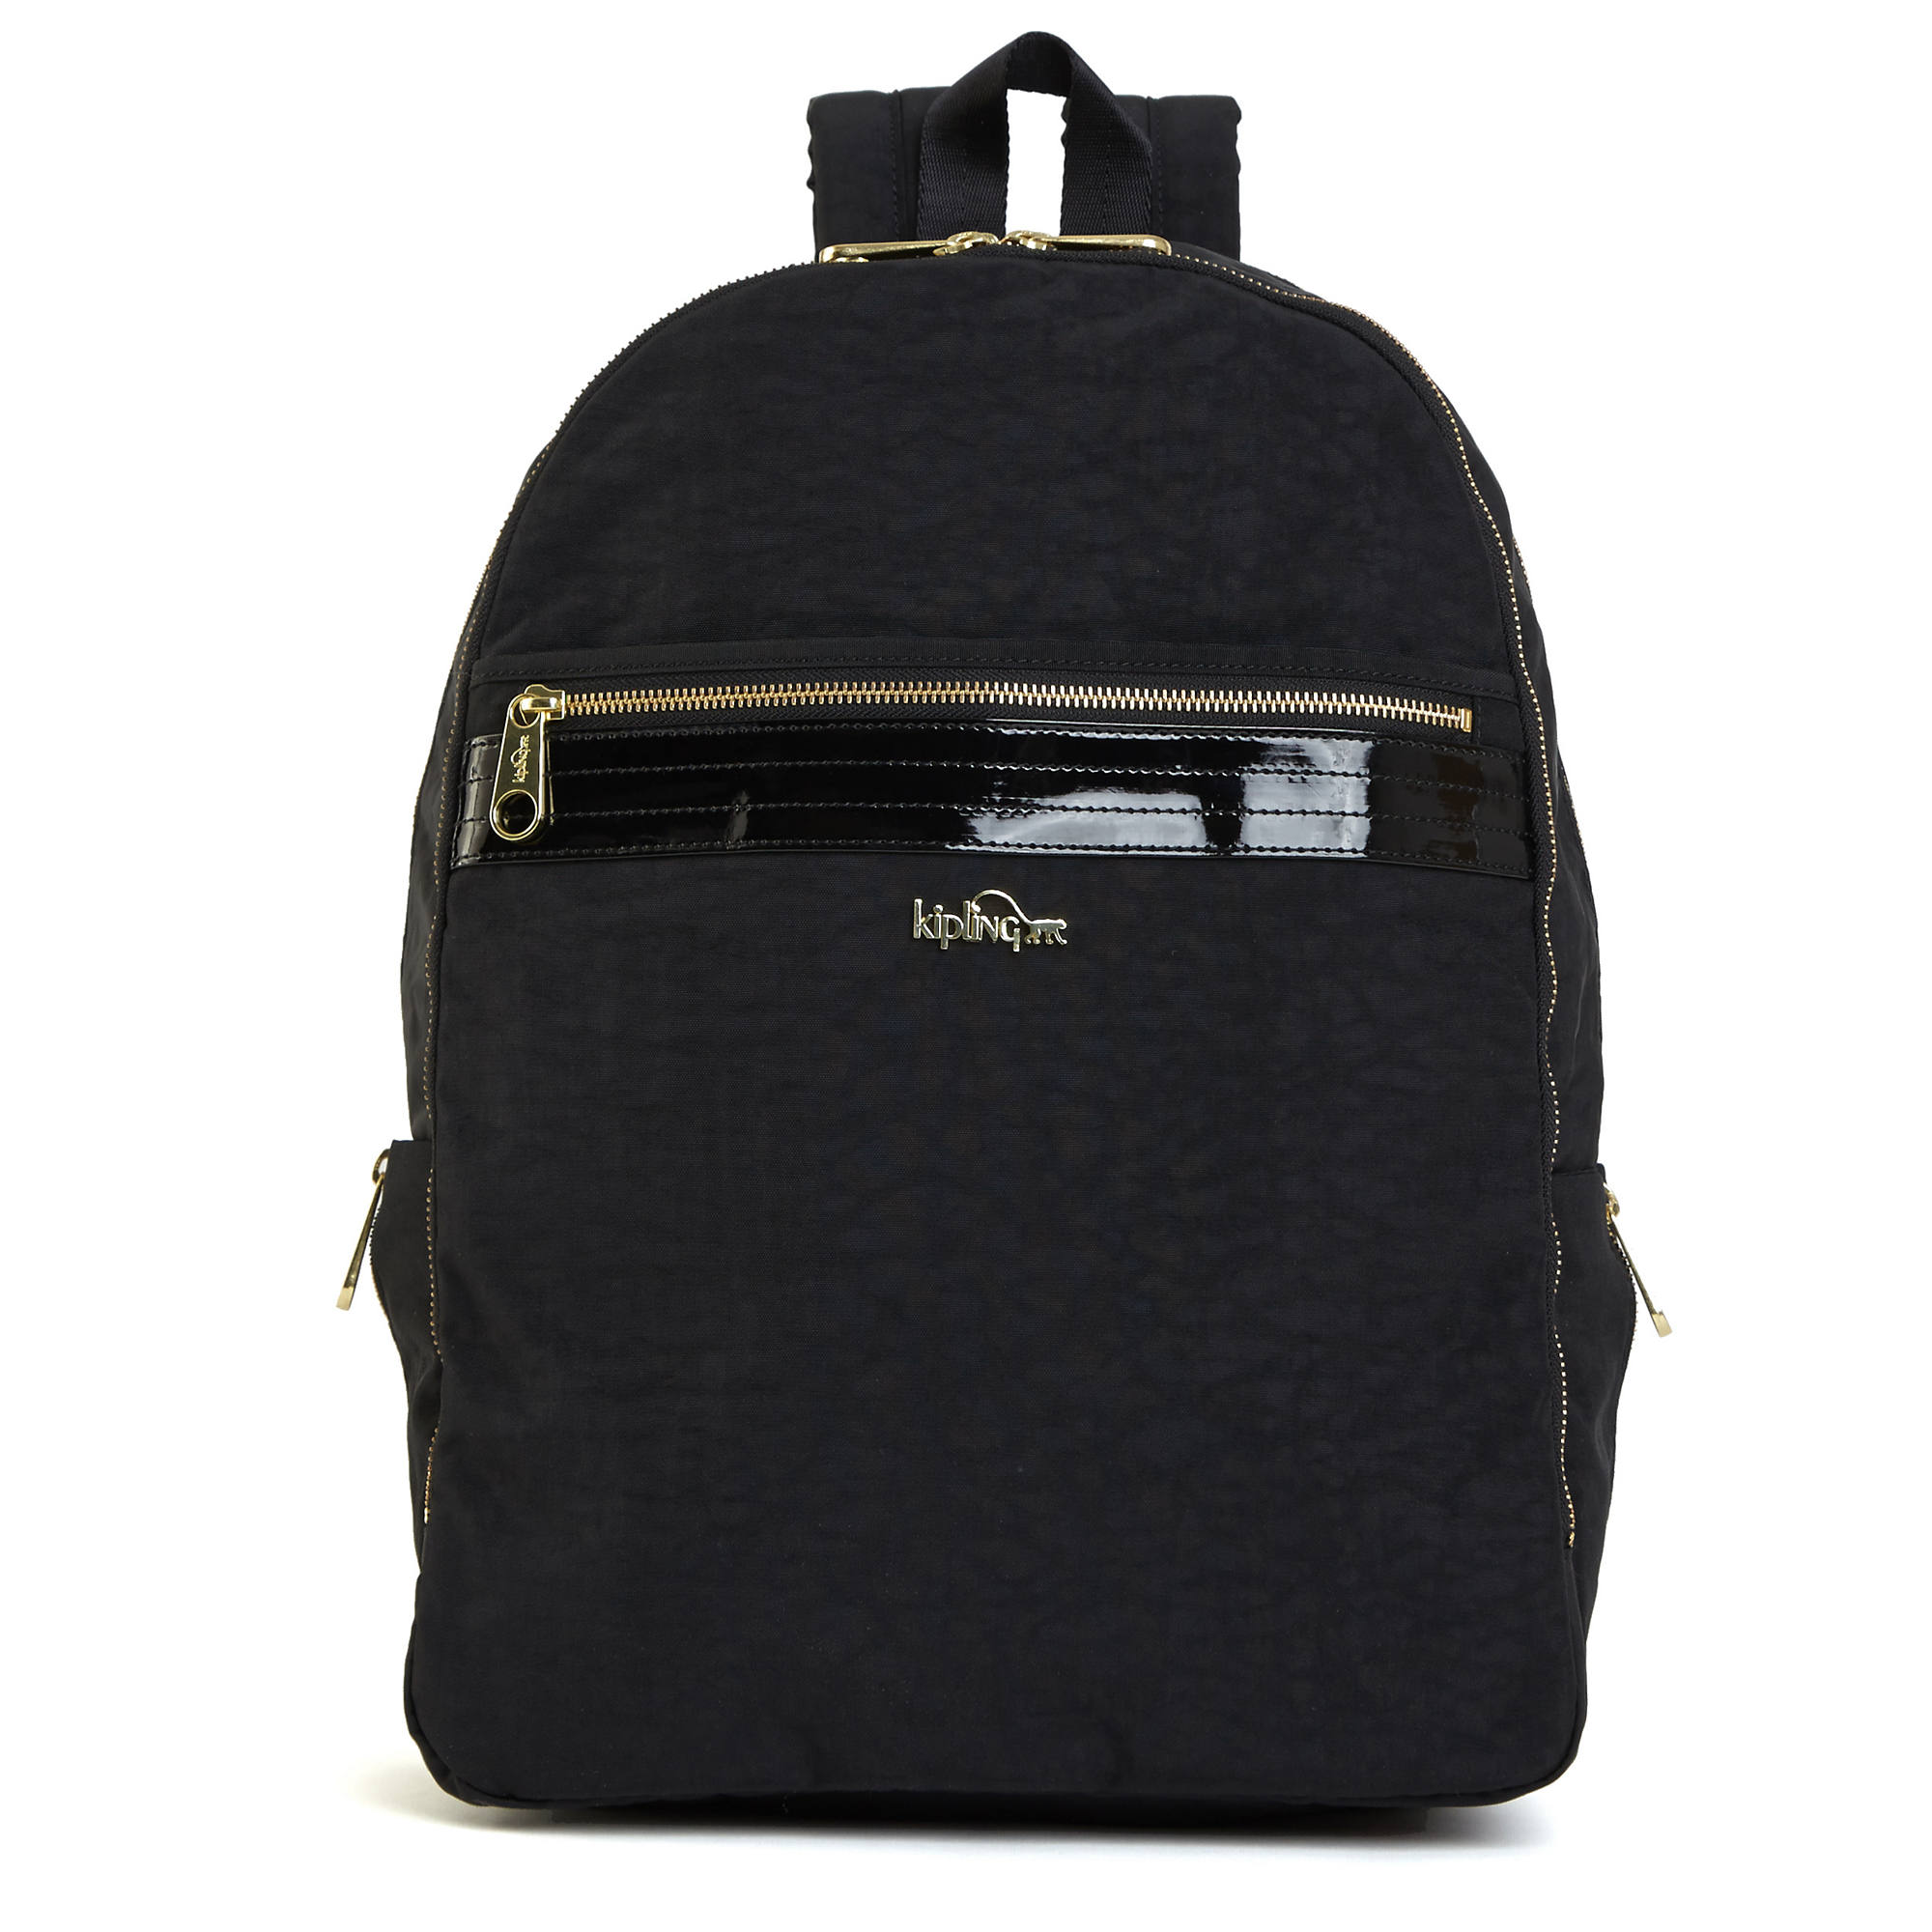 e2dff21a15 Deeda Large Laptop Backpack